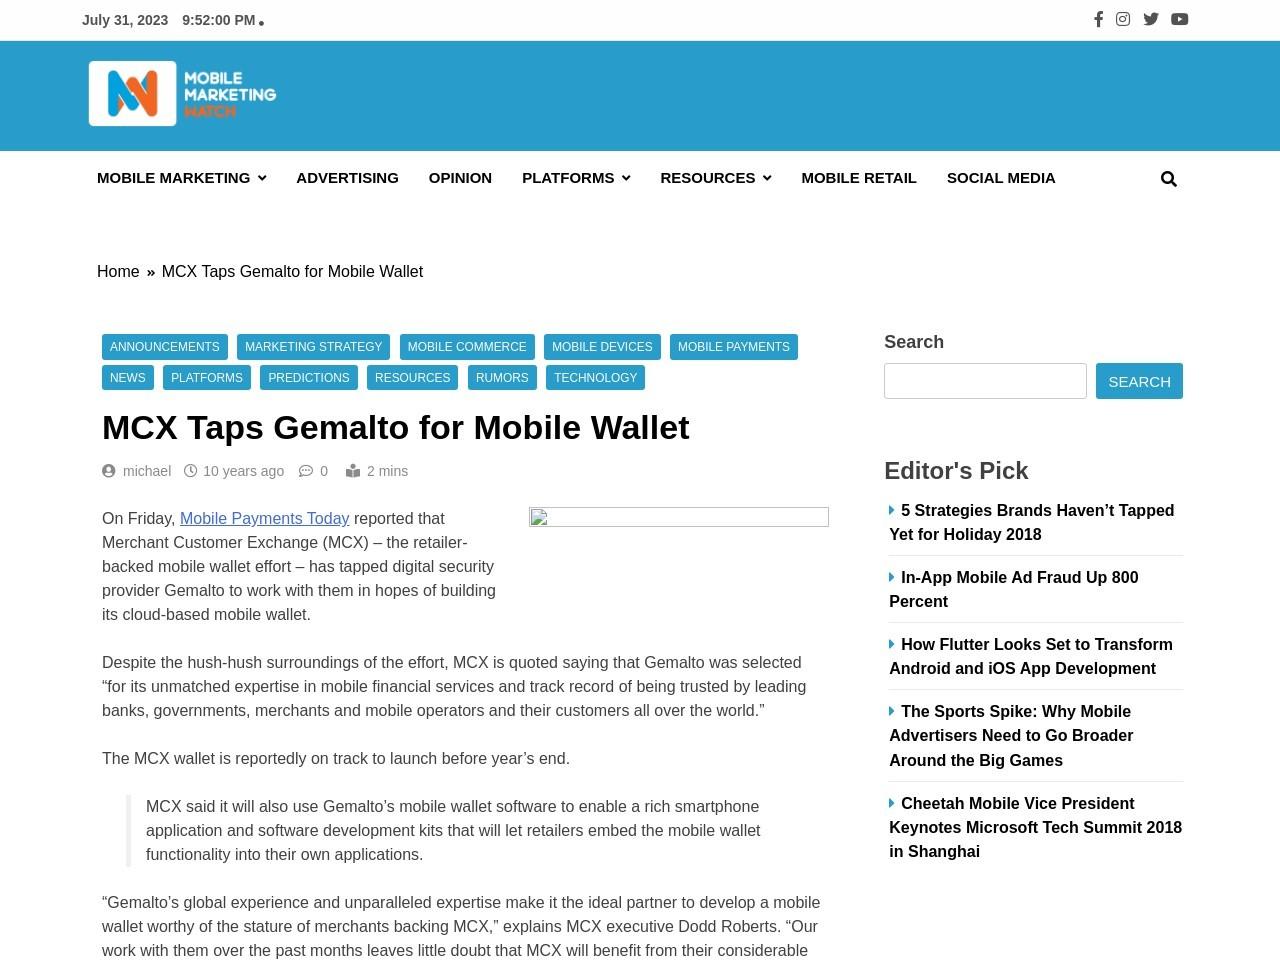 MCX Taps Gemalto for Mobile Wallet